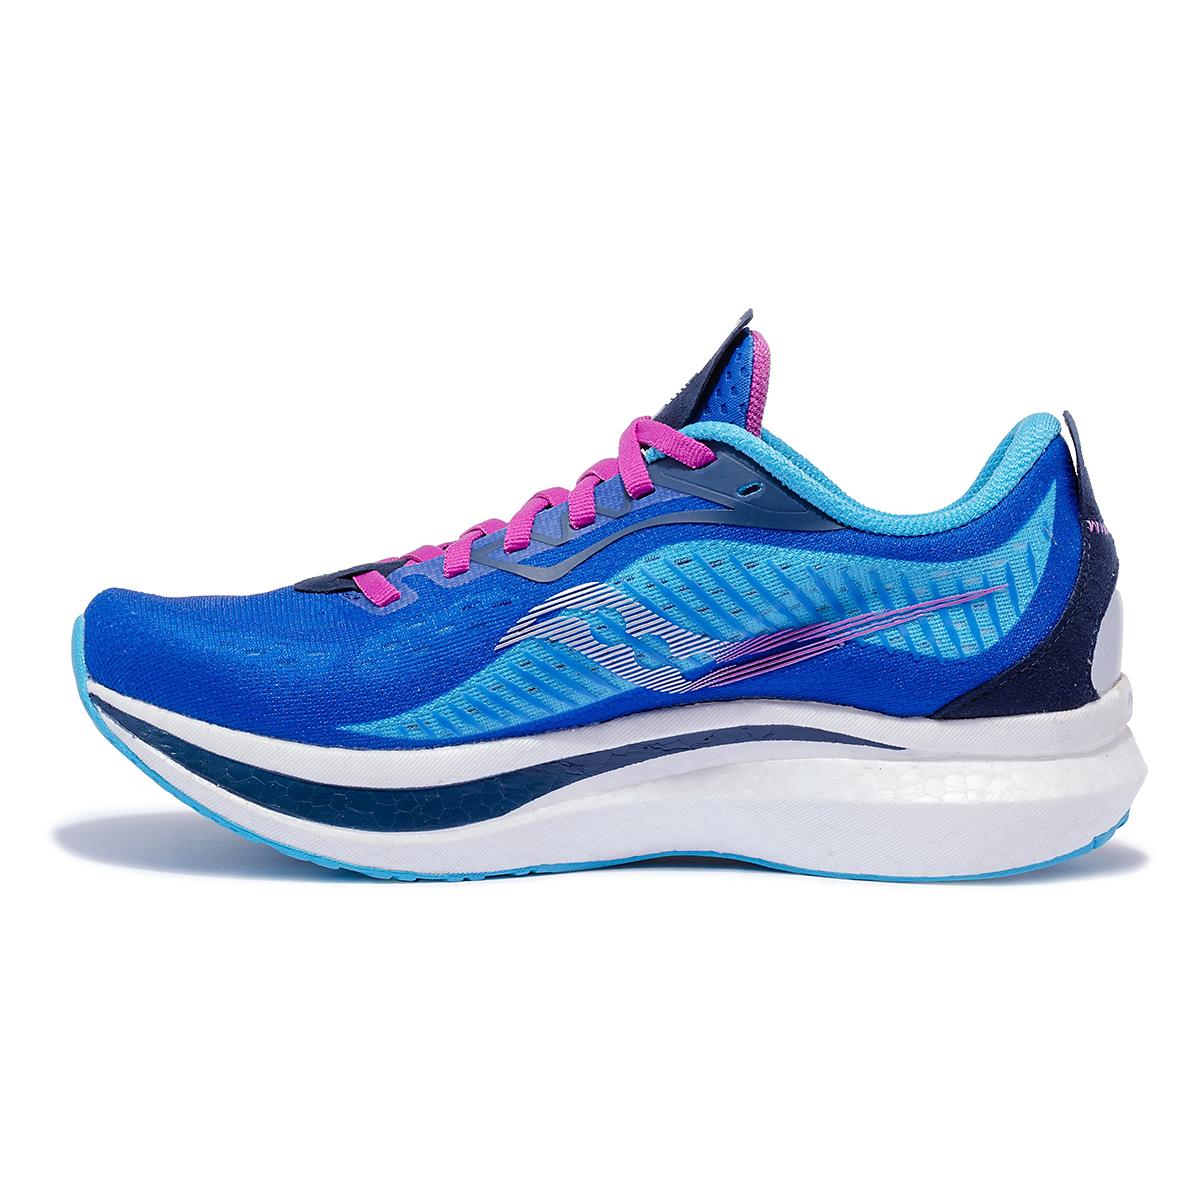 Women's Saucony Endorphin Speed 2 Running Shoe - Color: Royal / Blaze - Size: 5 - Width: Regular, Royal / Blaze, large, image 2